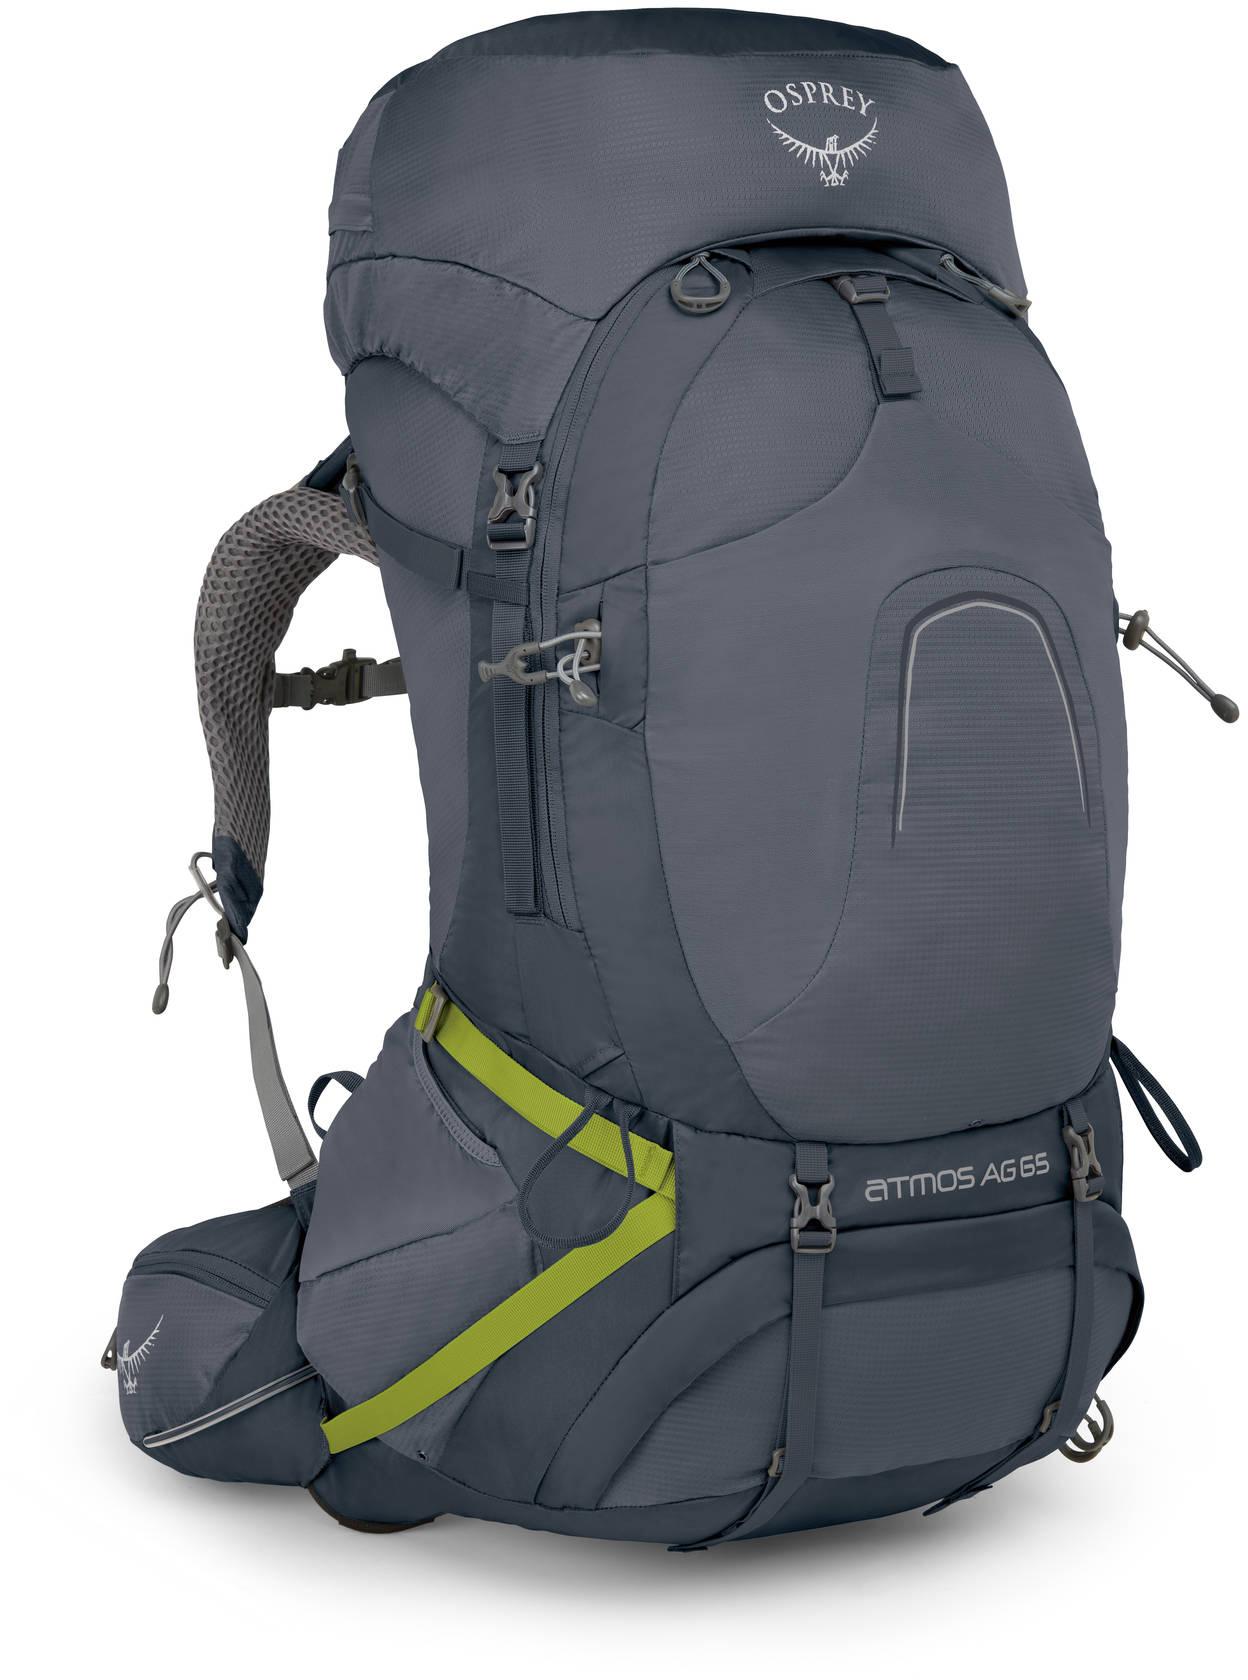 Туристические рюкзаки Рюкзак туристический Osprey Atmos AG 65 Abyss Grey Atmos_AG_65_S18_Side_Abyss_Grey_web.jpg